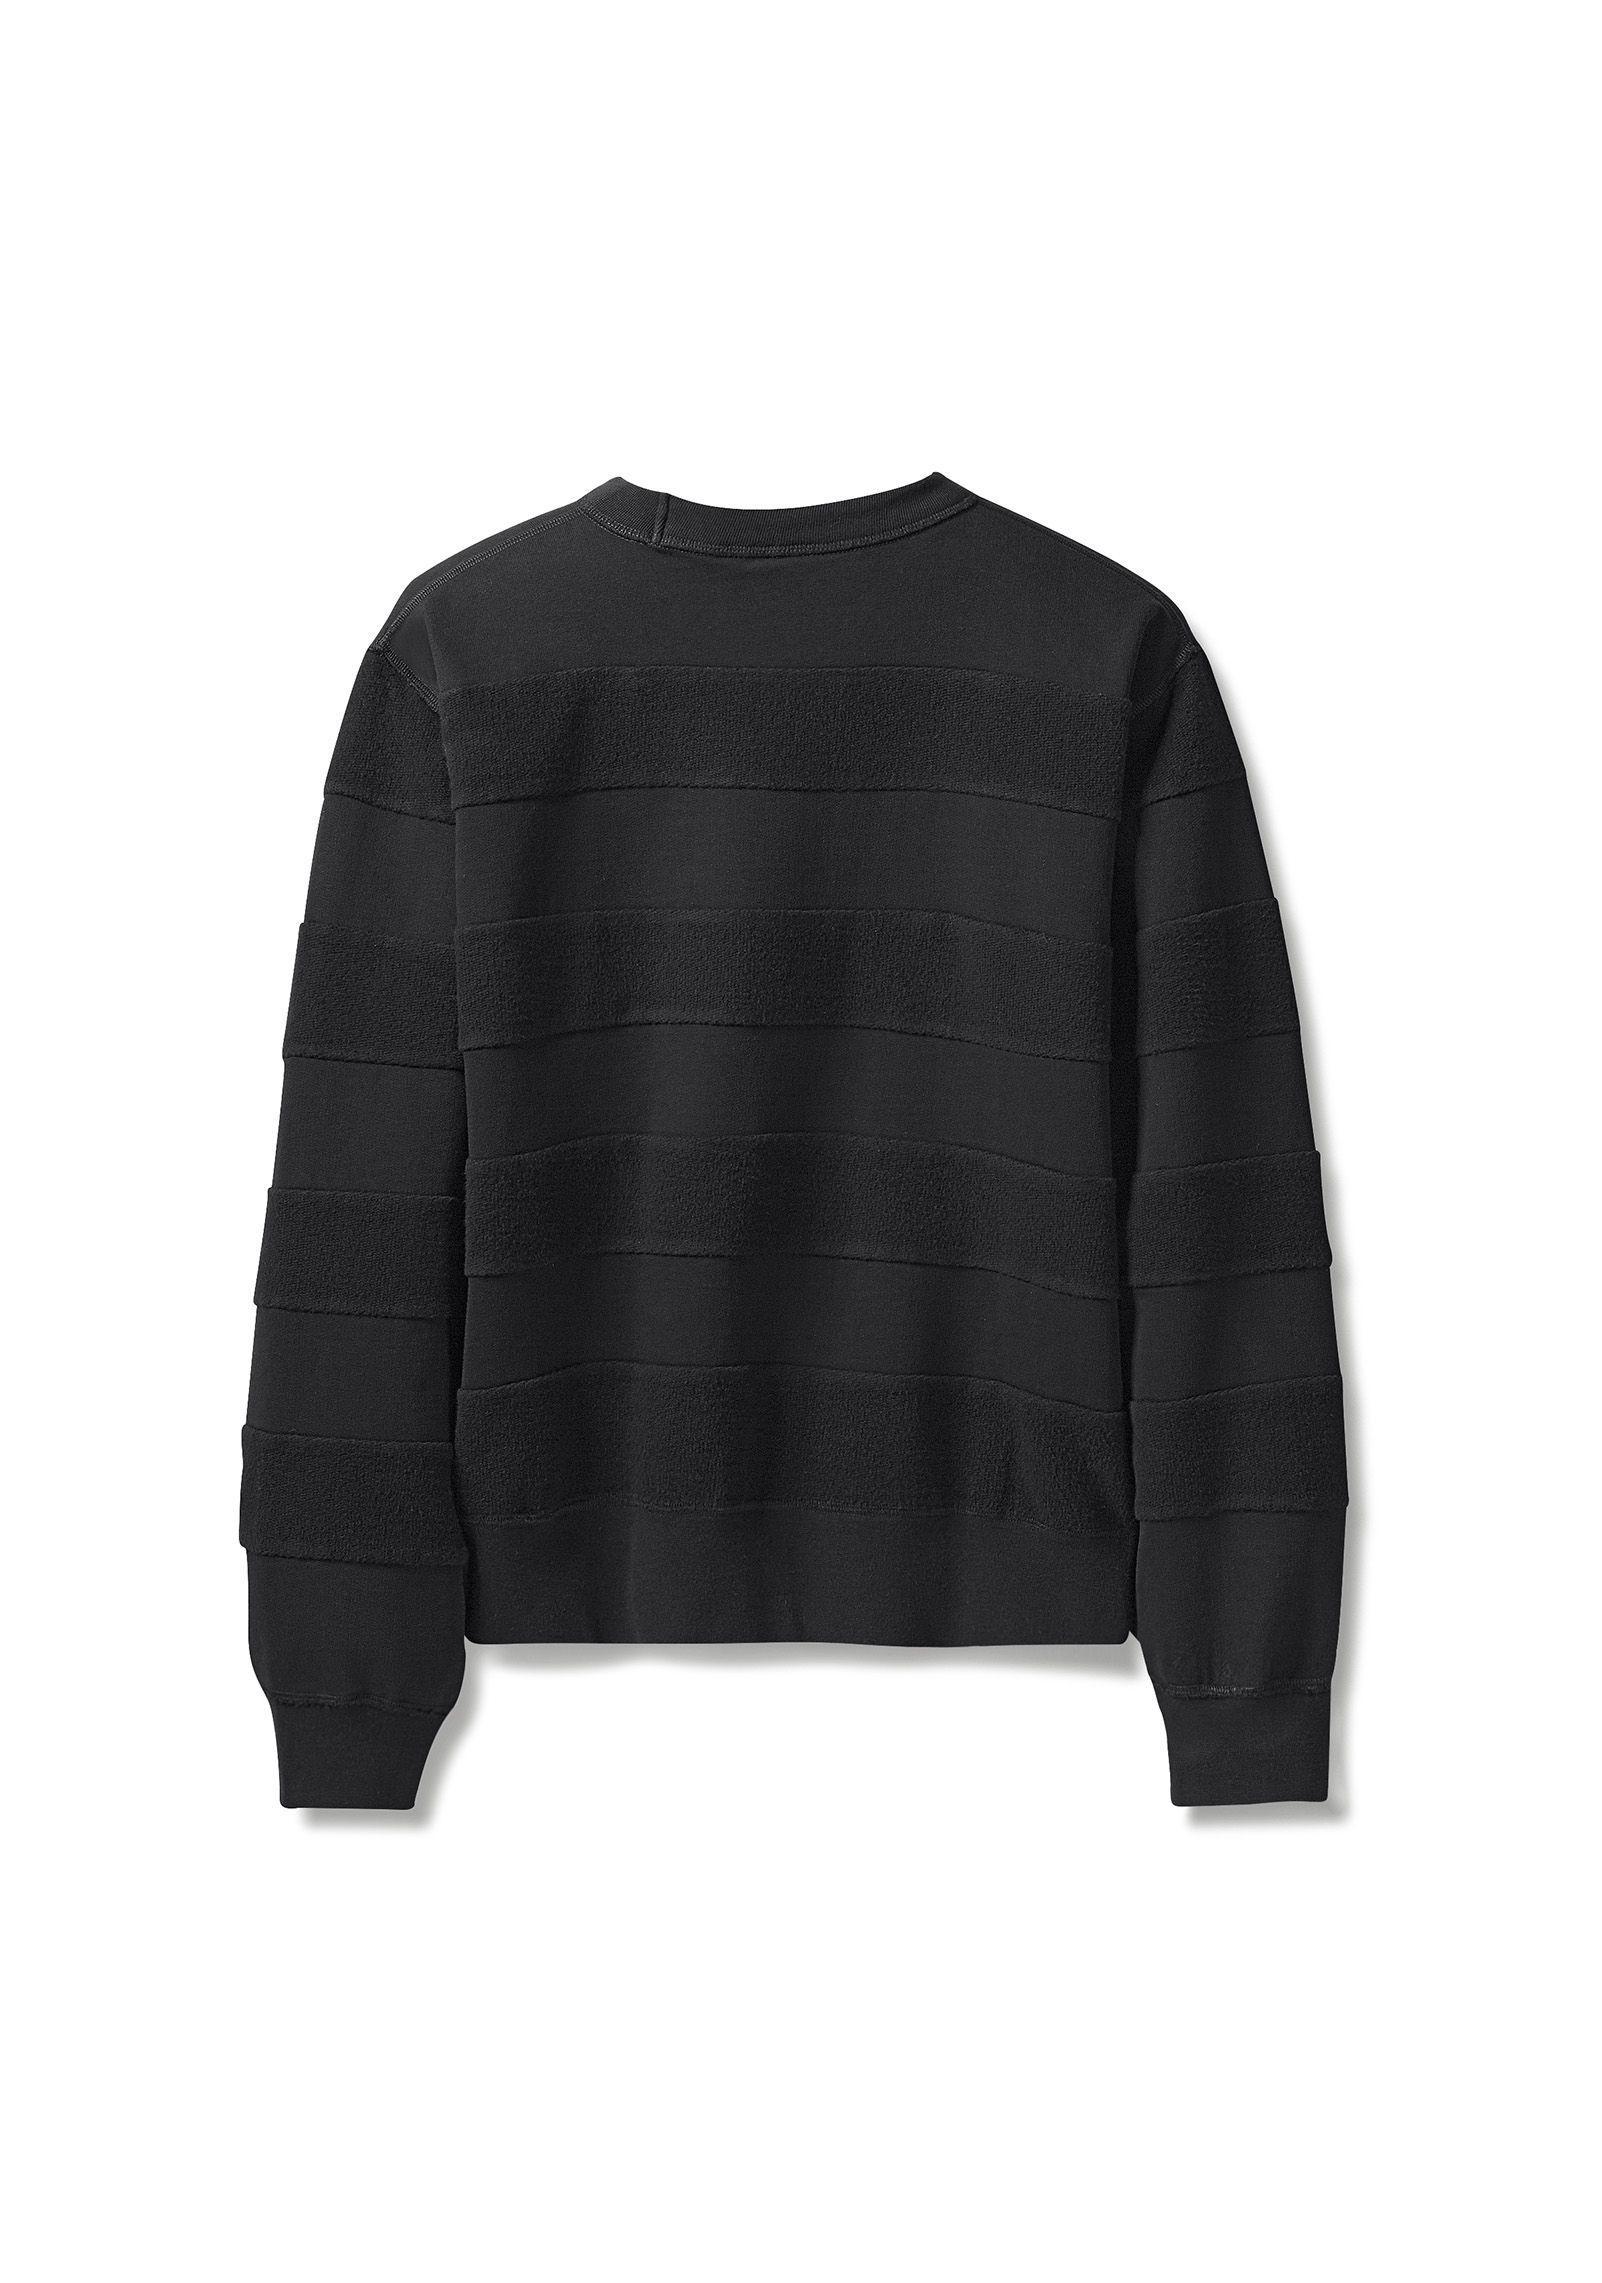 Lyst - Alexander Wang Adidas Orignals By Aw Inside-out Sweatshirt in ... c2c4f9e7c43f2